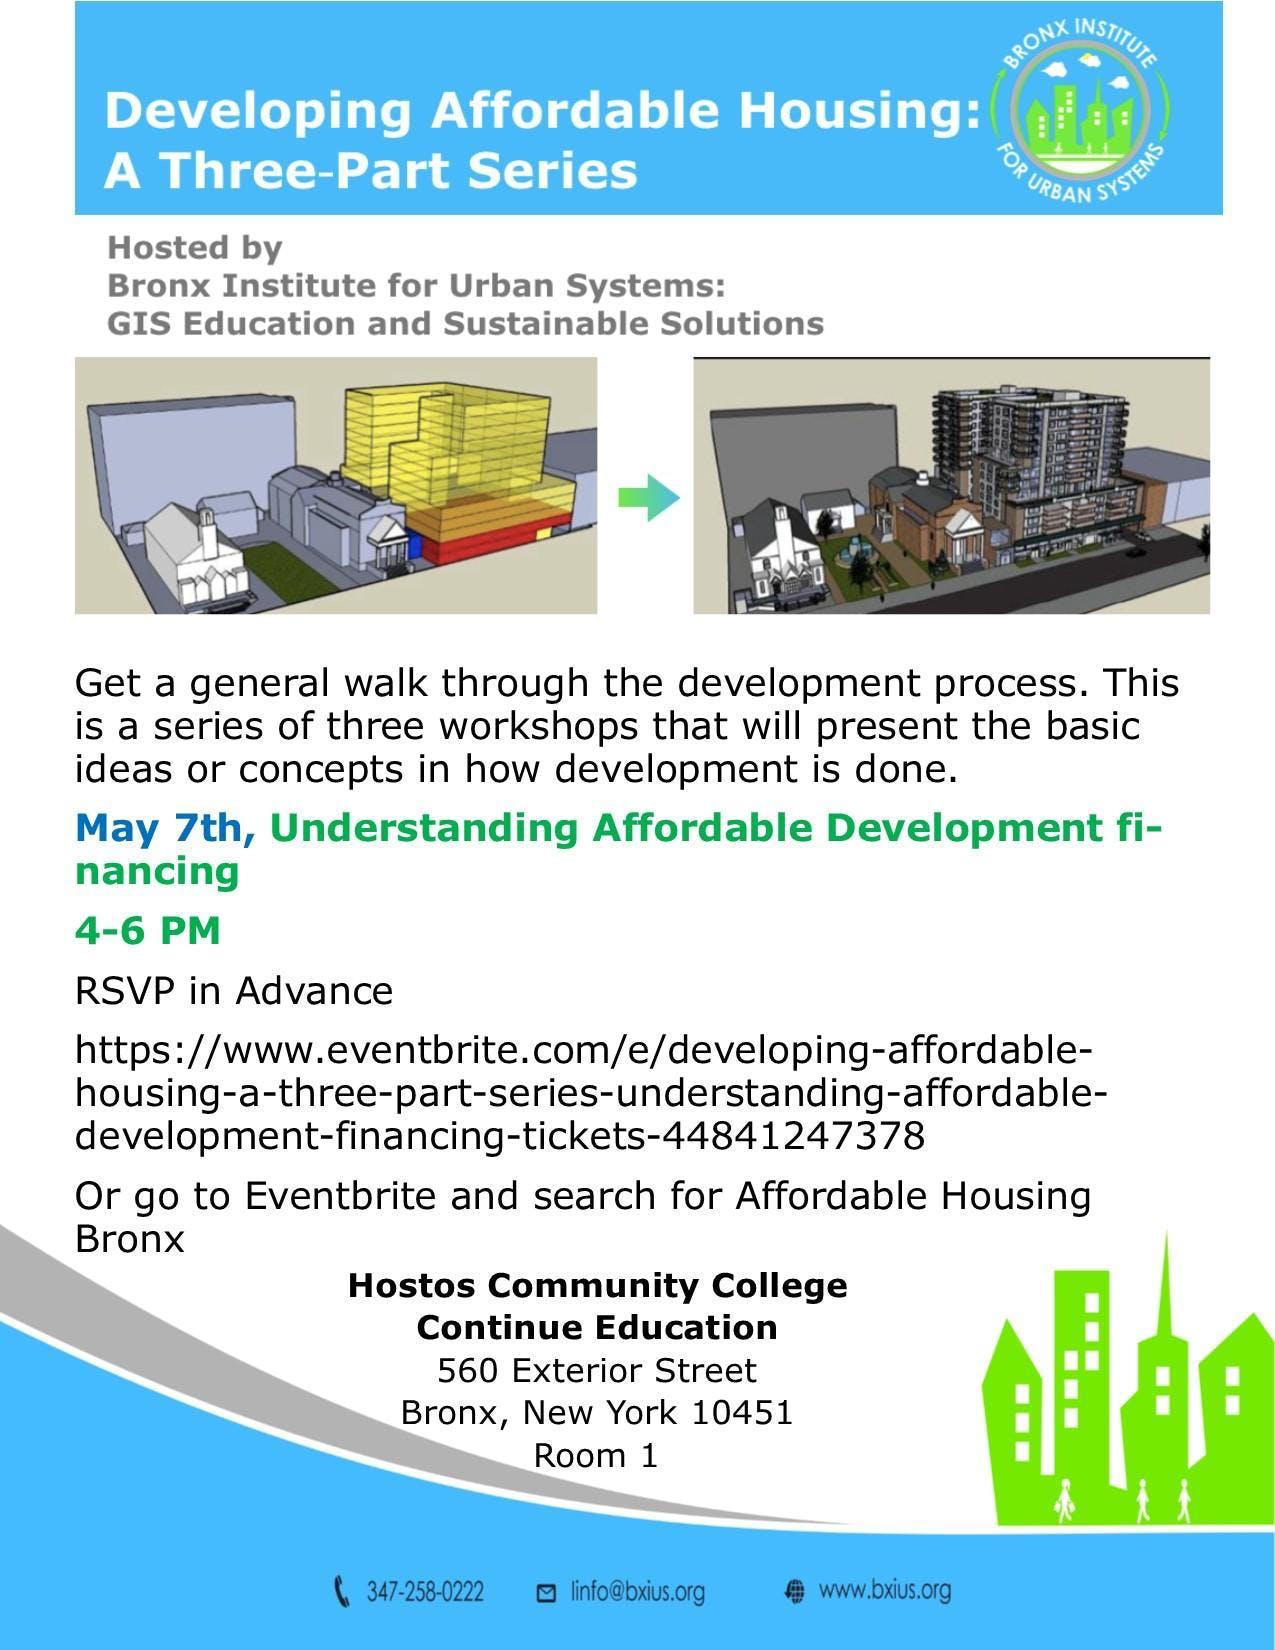 Exceptional Hostos Community College Continue Education, 560 Exterior Street, Bronx,  United States